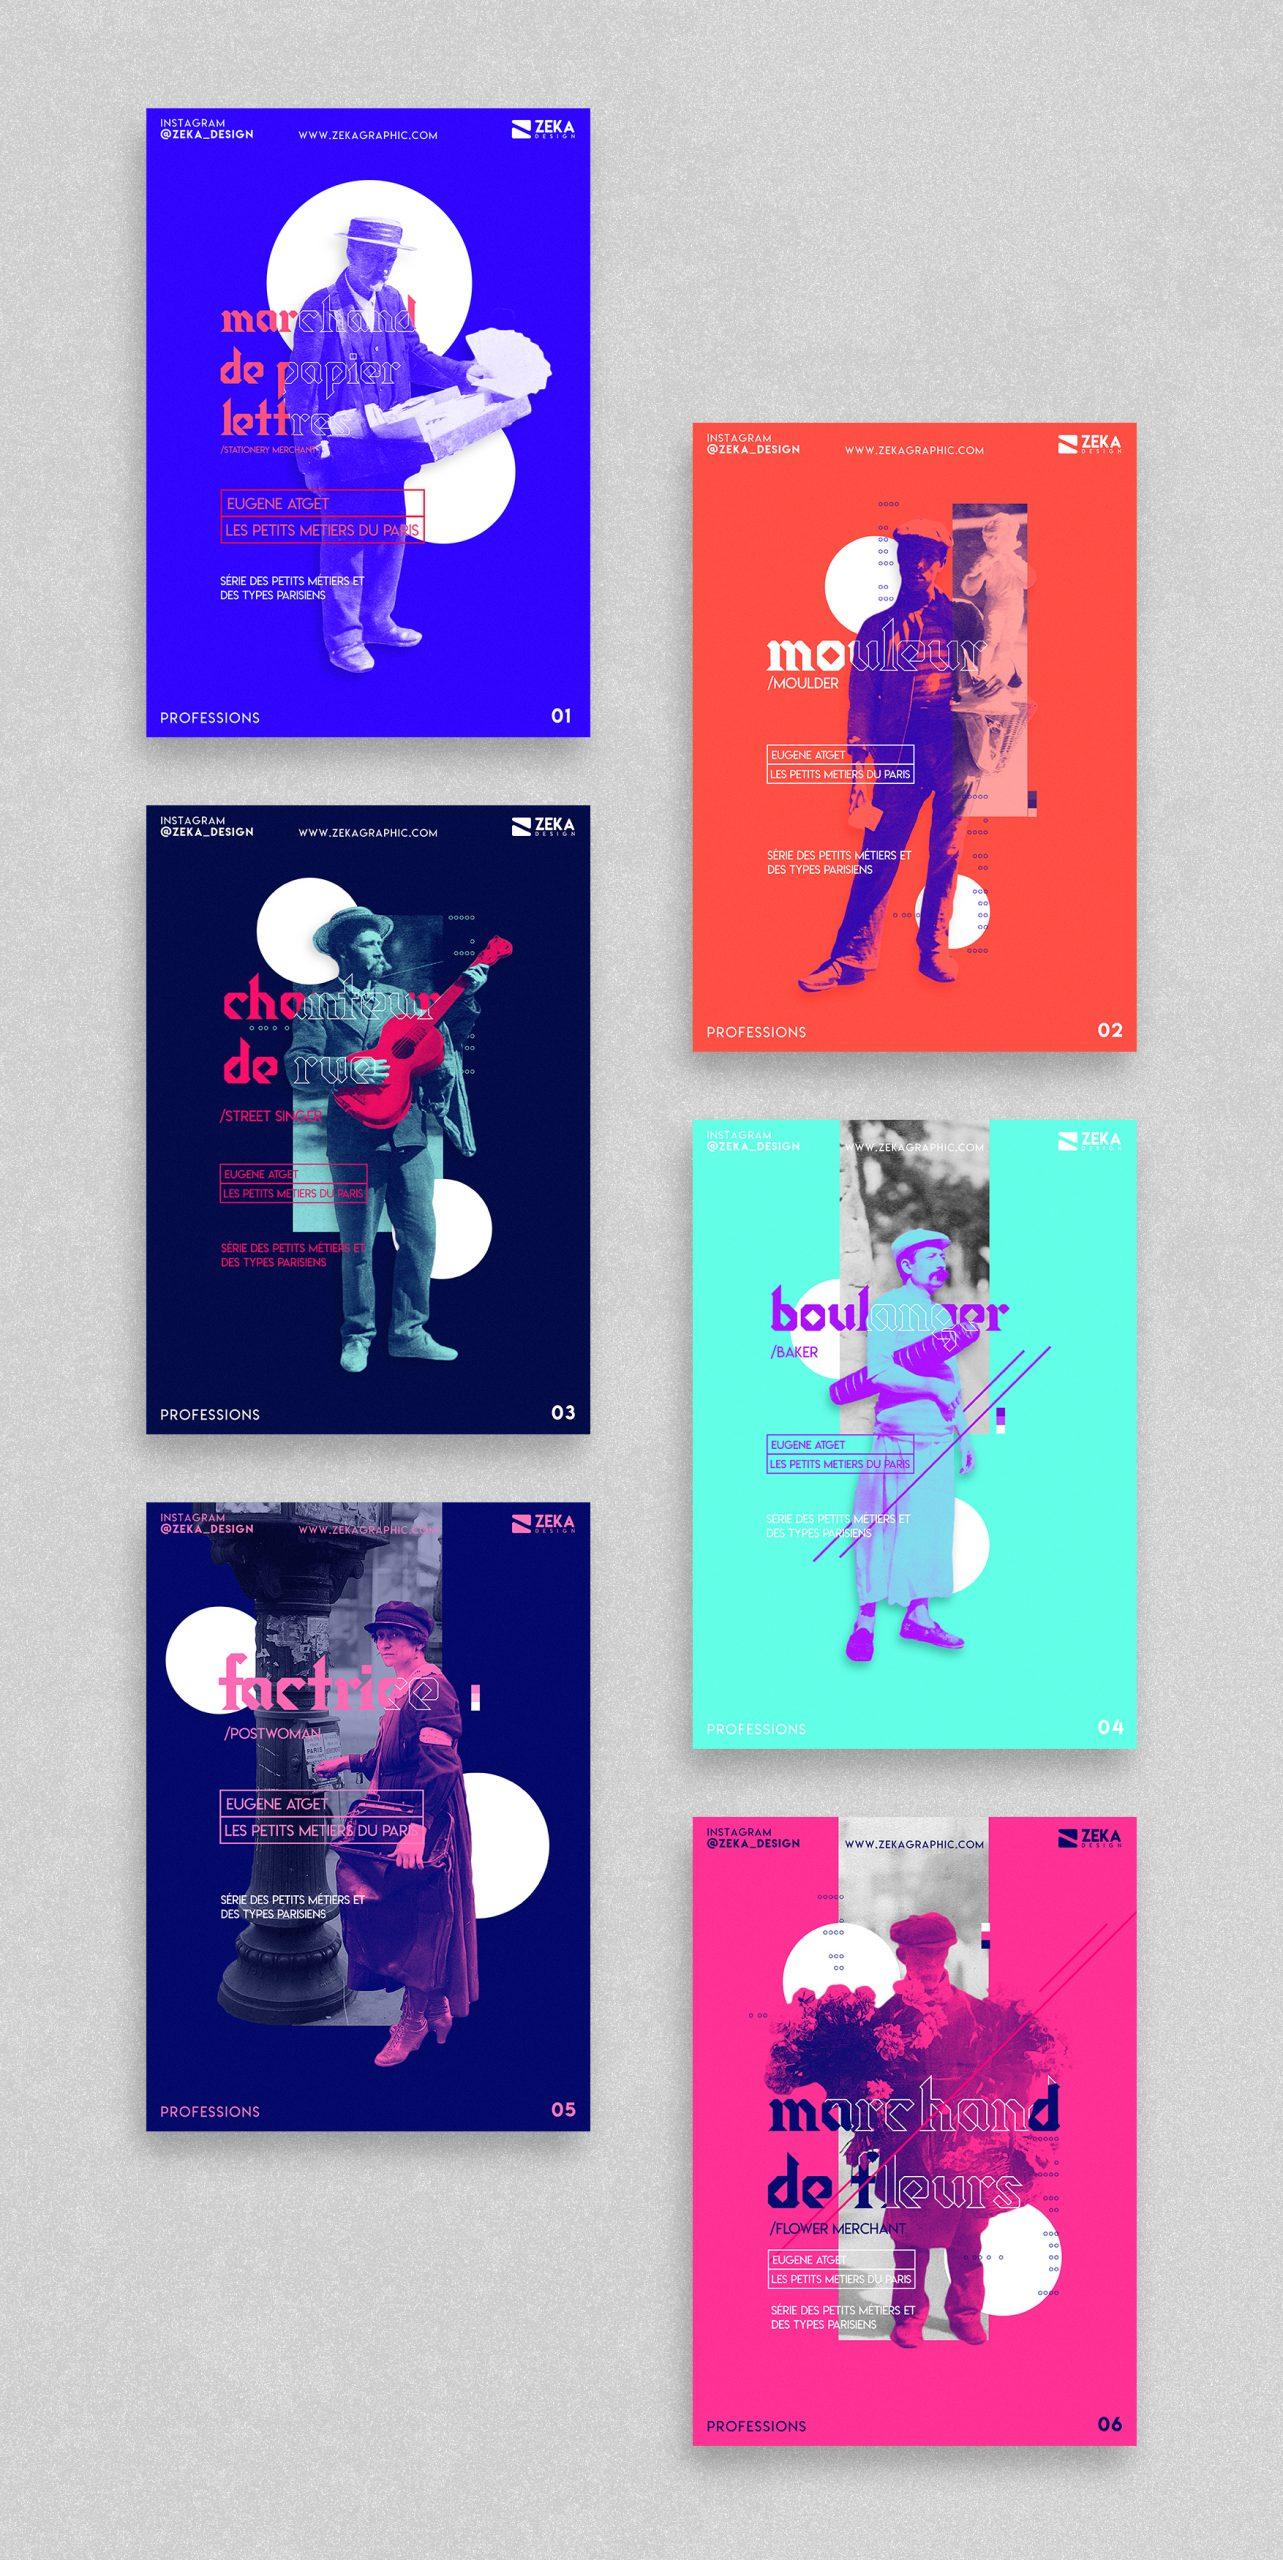 2020 Professions Color Poster Design Collection Zeka Design